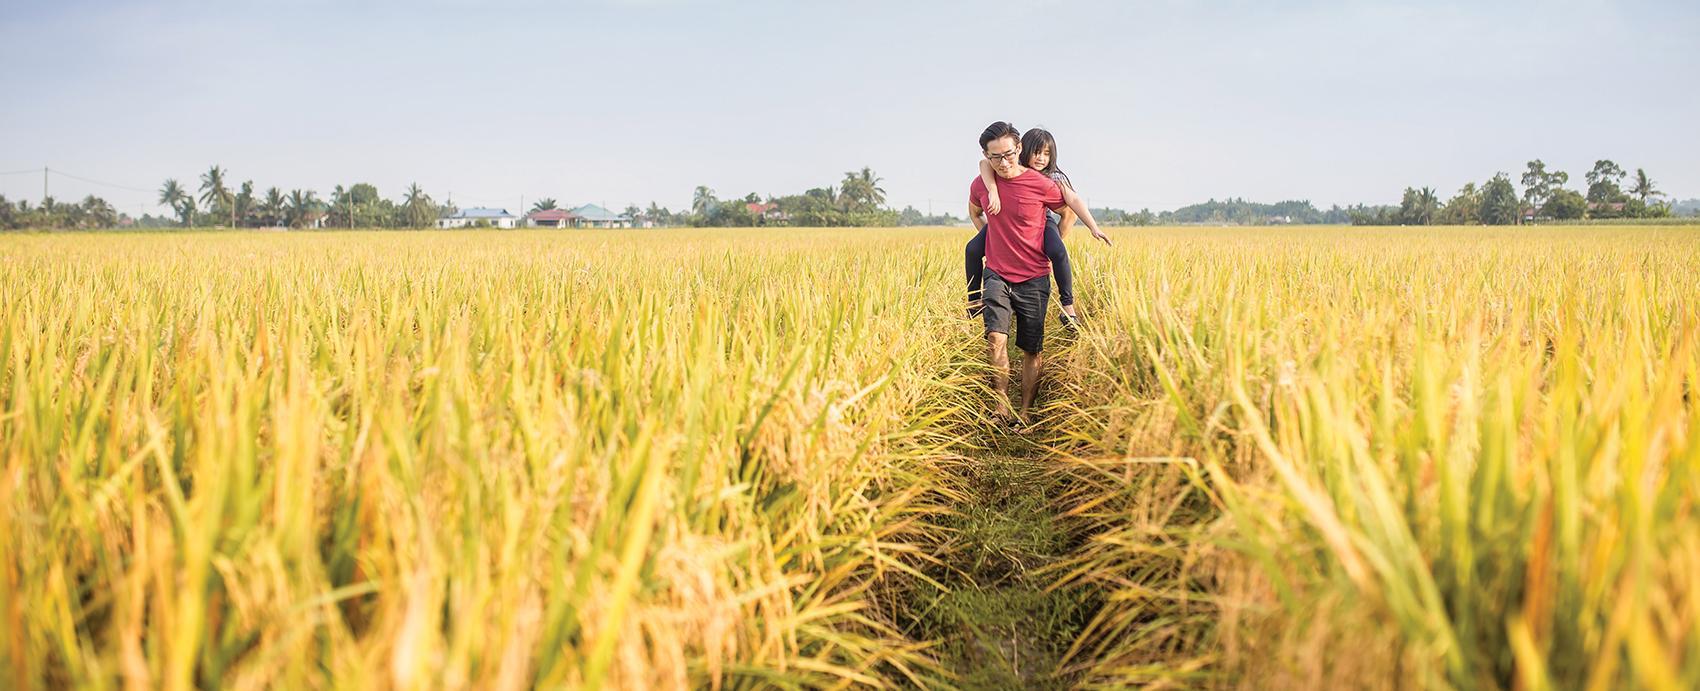 man_father_girl_child_walking_grass_fields_2102_1700w.jpg